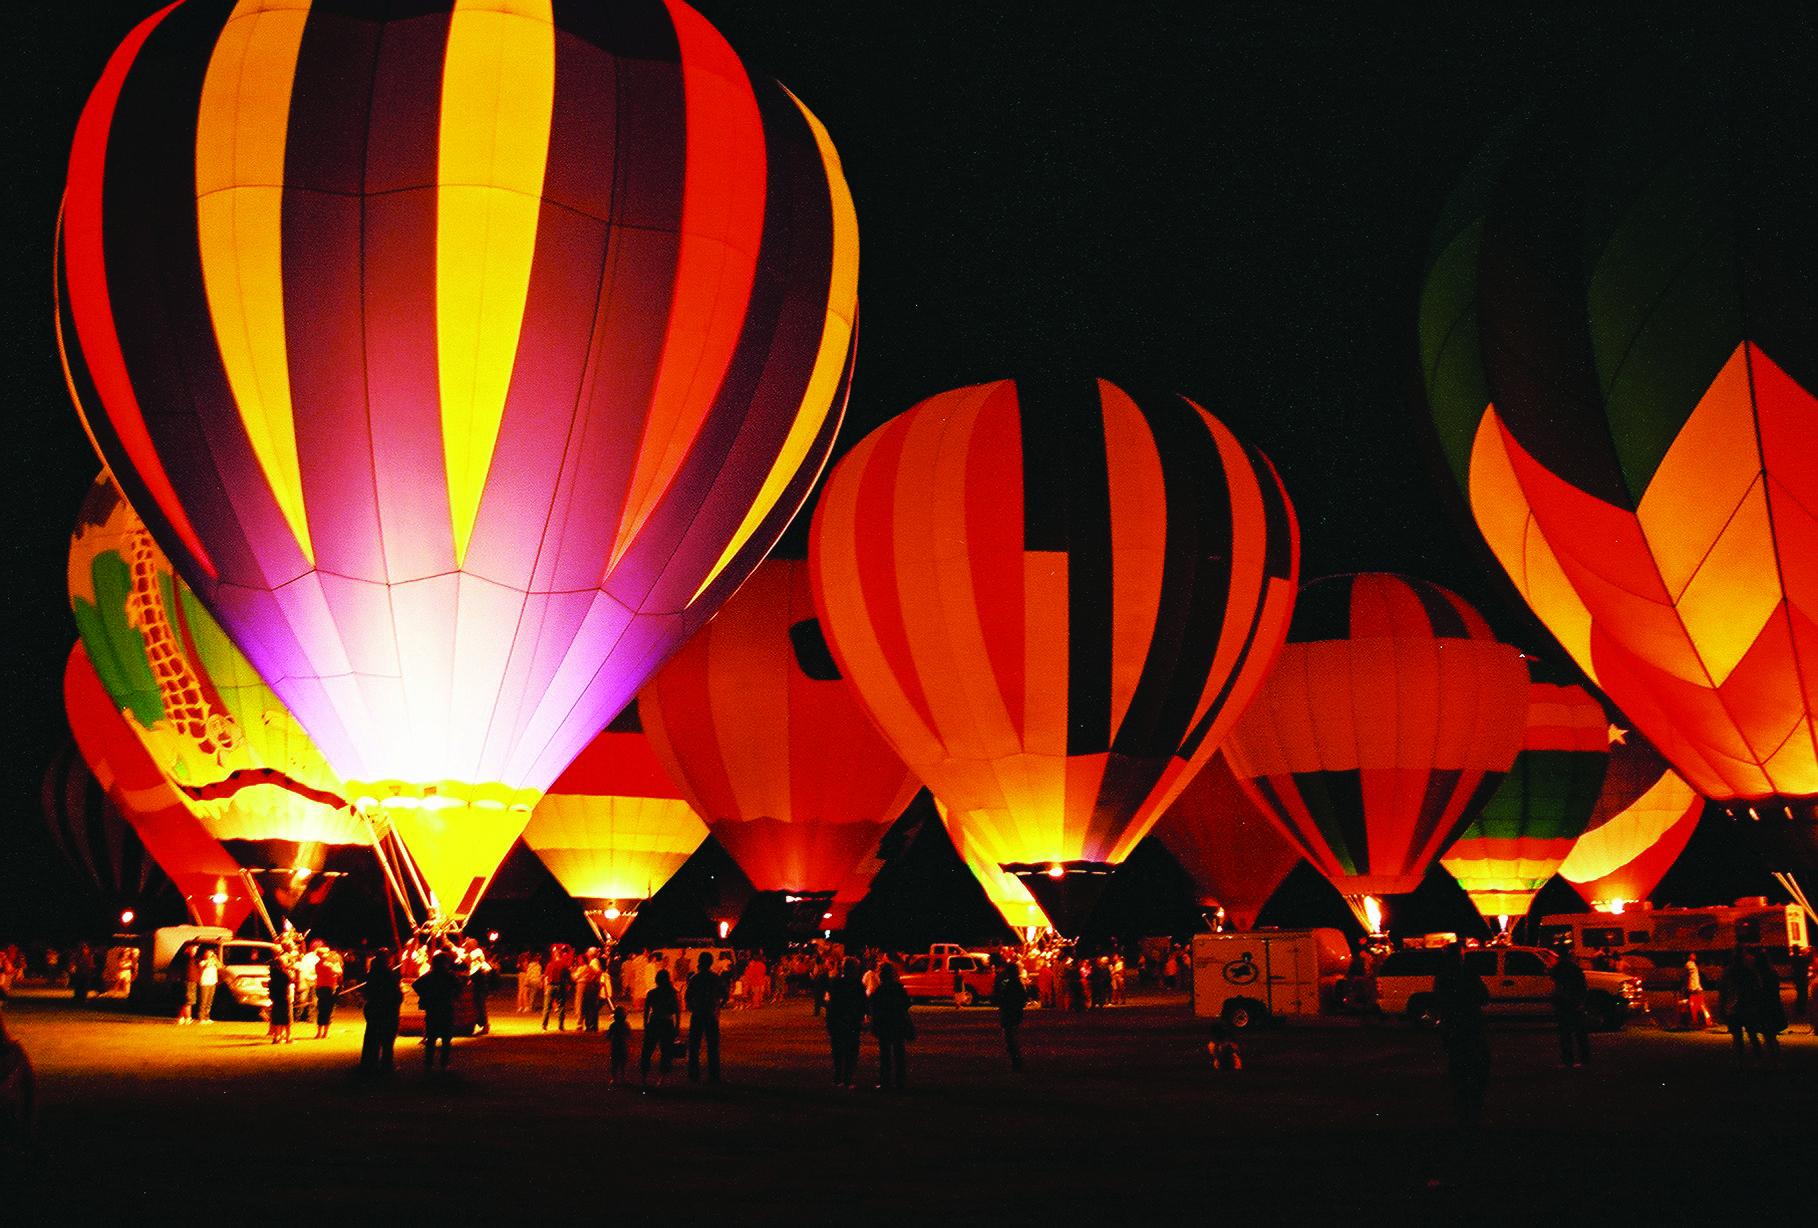 Balloon festival in Plano, TX Balloon festivals